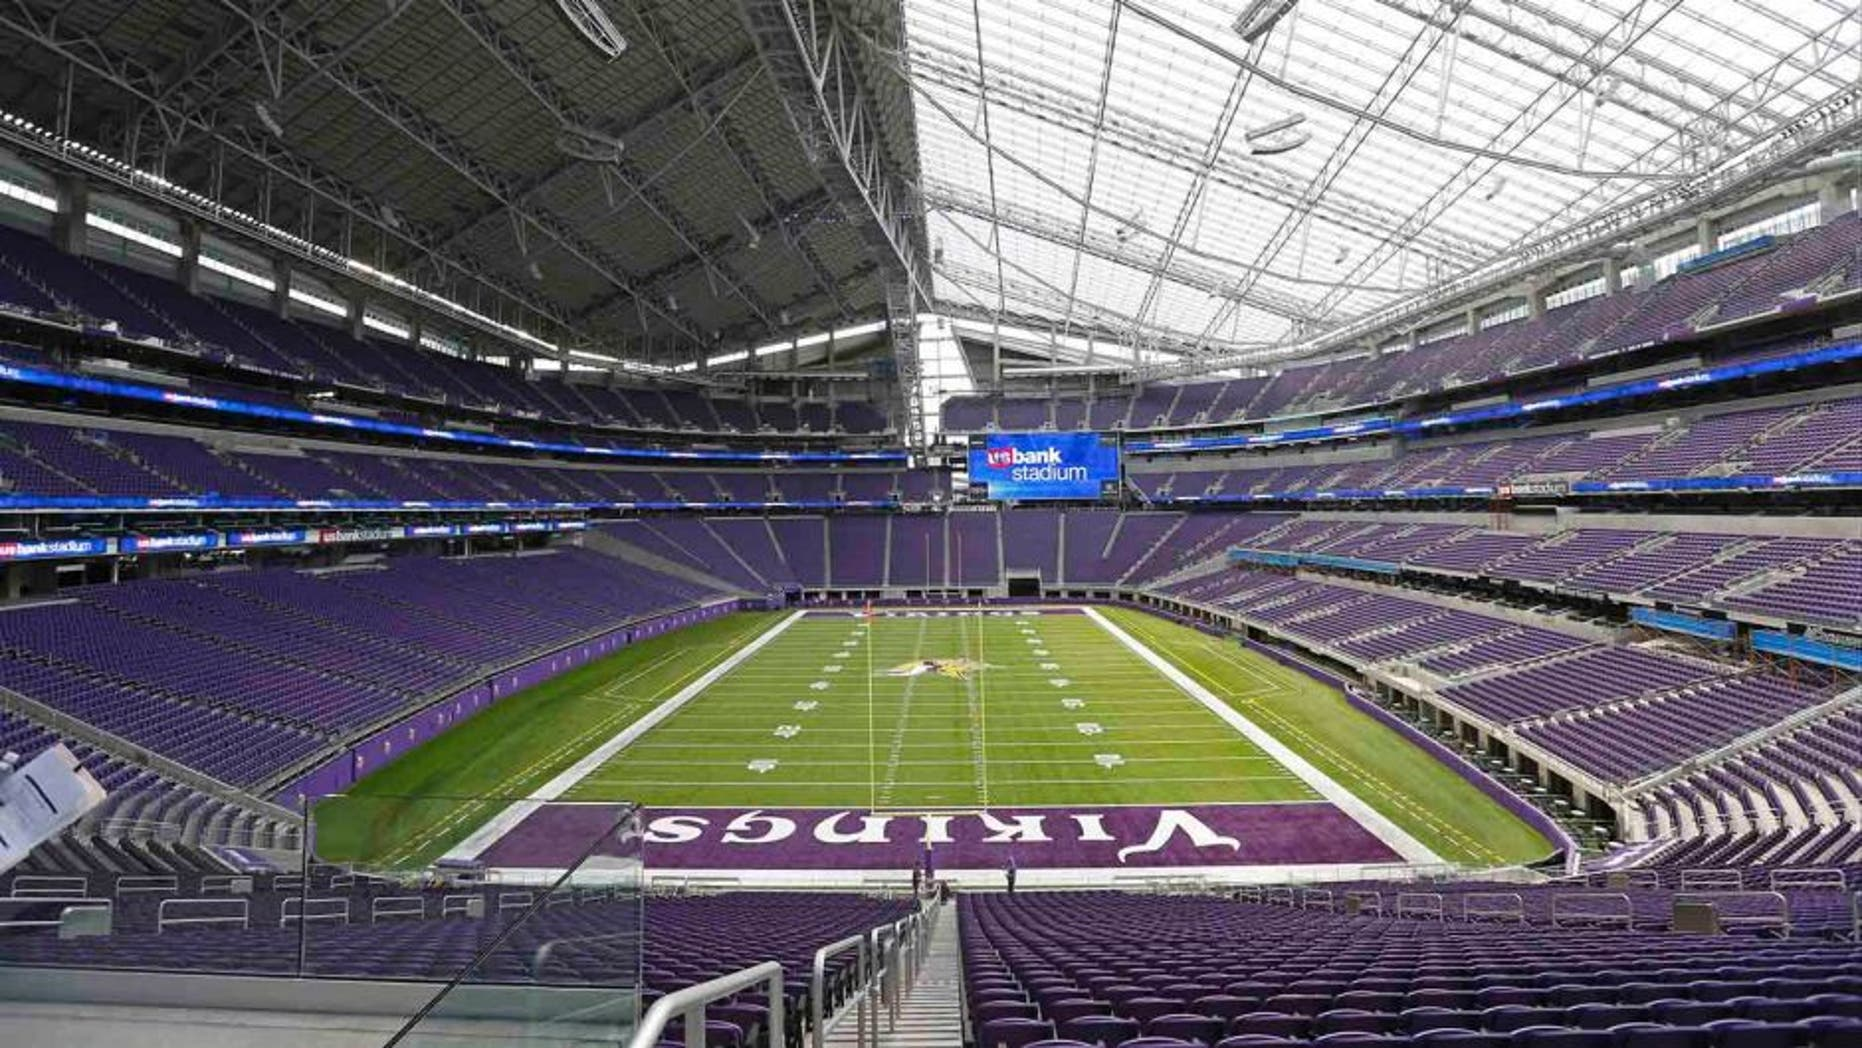 Construction on U.S. Bank Stadium ultimately cost nearly $1.1 billion.